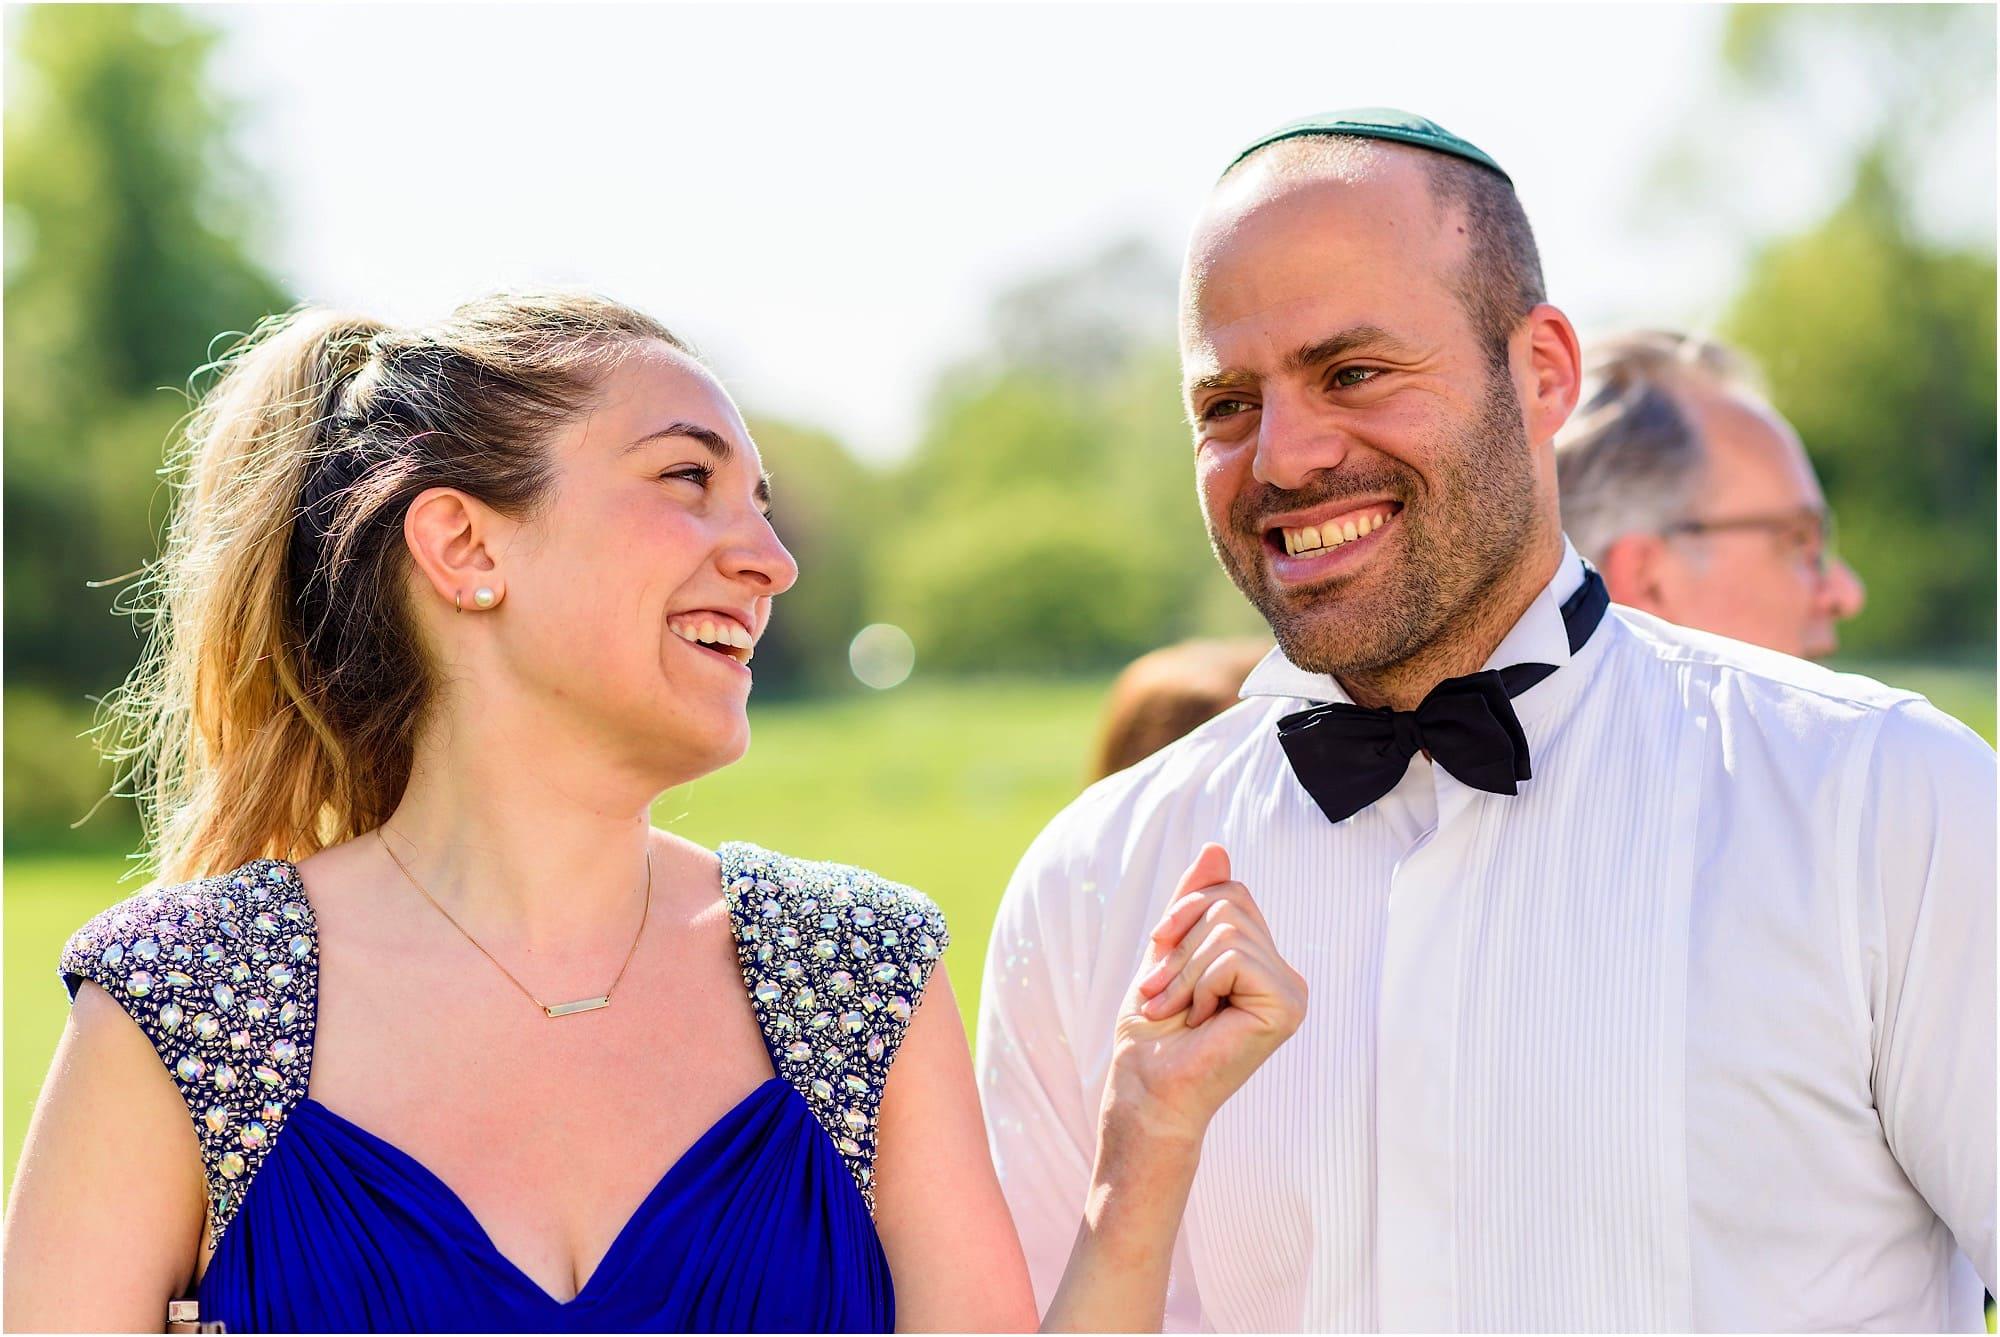 Jewish wedding guests